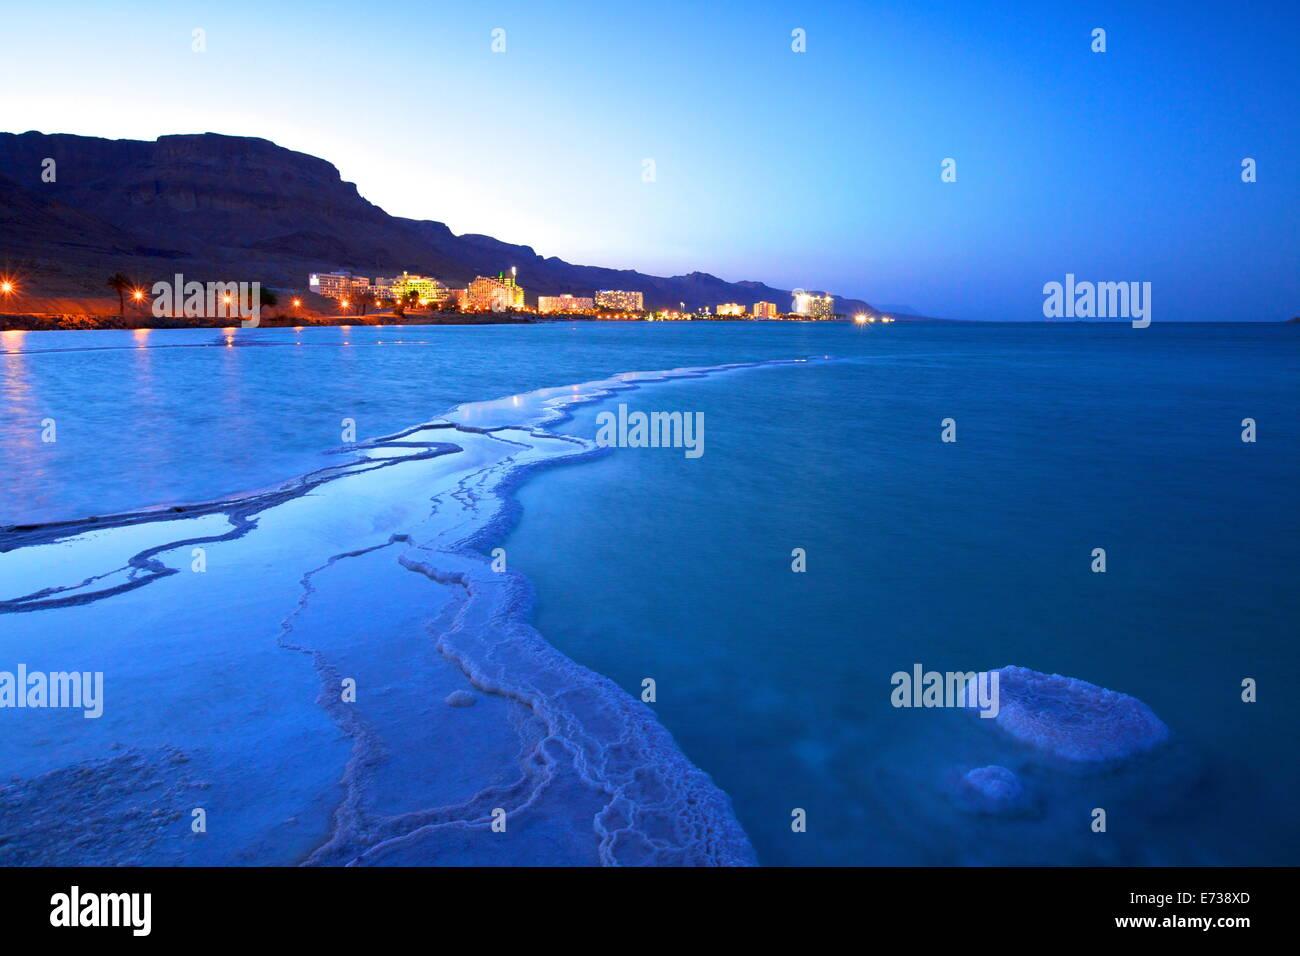 Gisement de sel en premier plan à l'égard Ein Bokek, Ein Bokek, Dead Sea, Israël, Moyen Orient Photo Stock